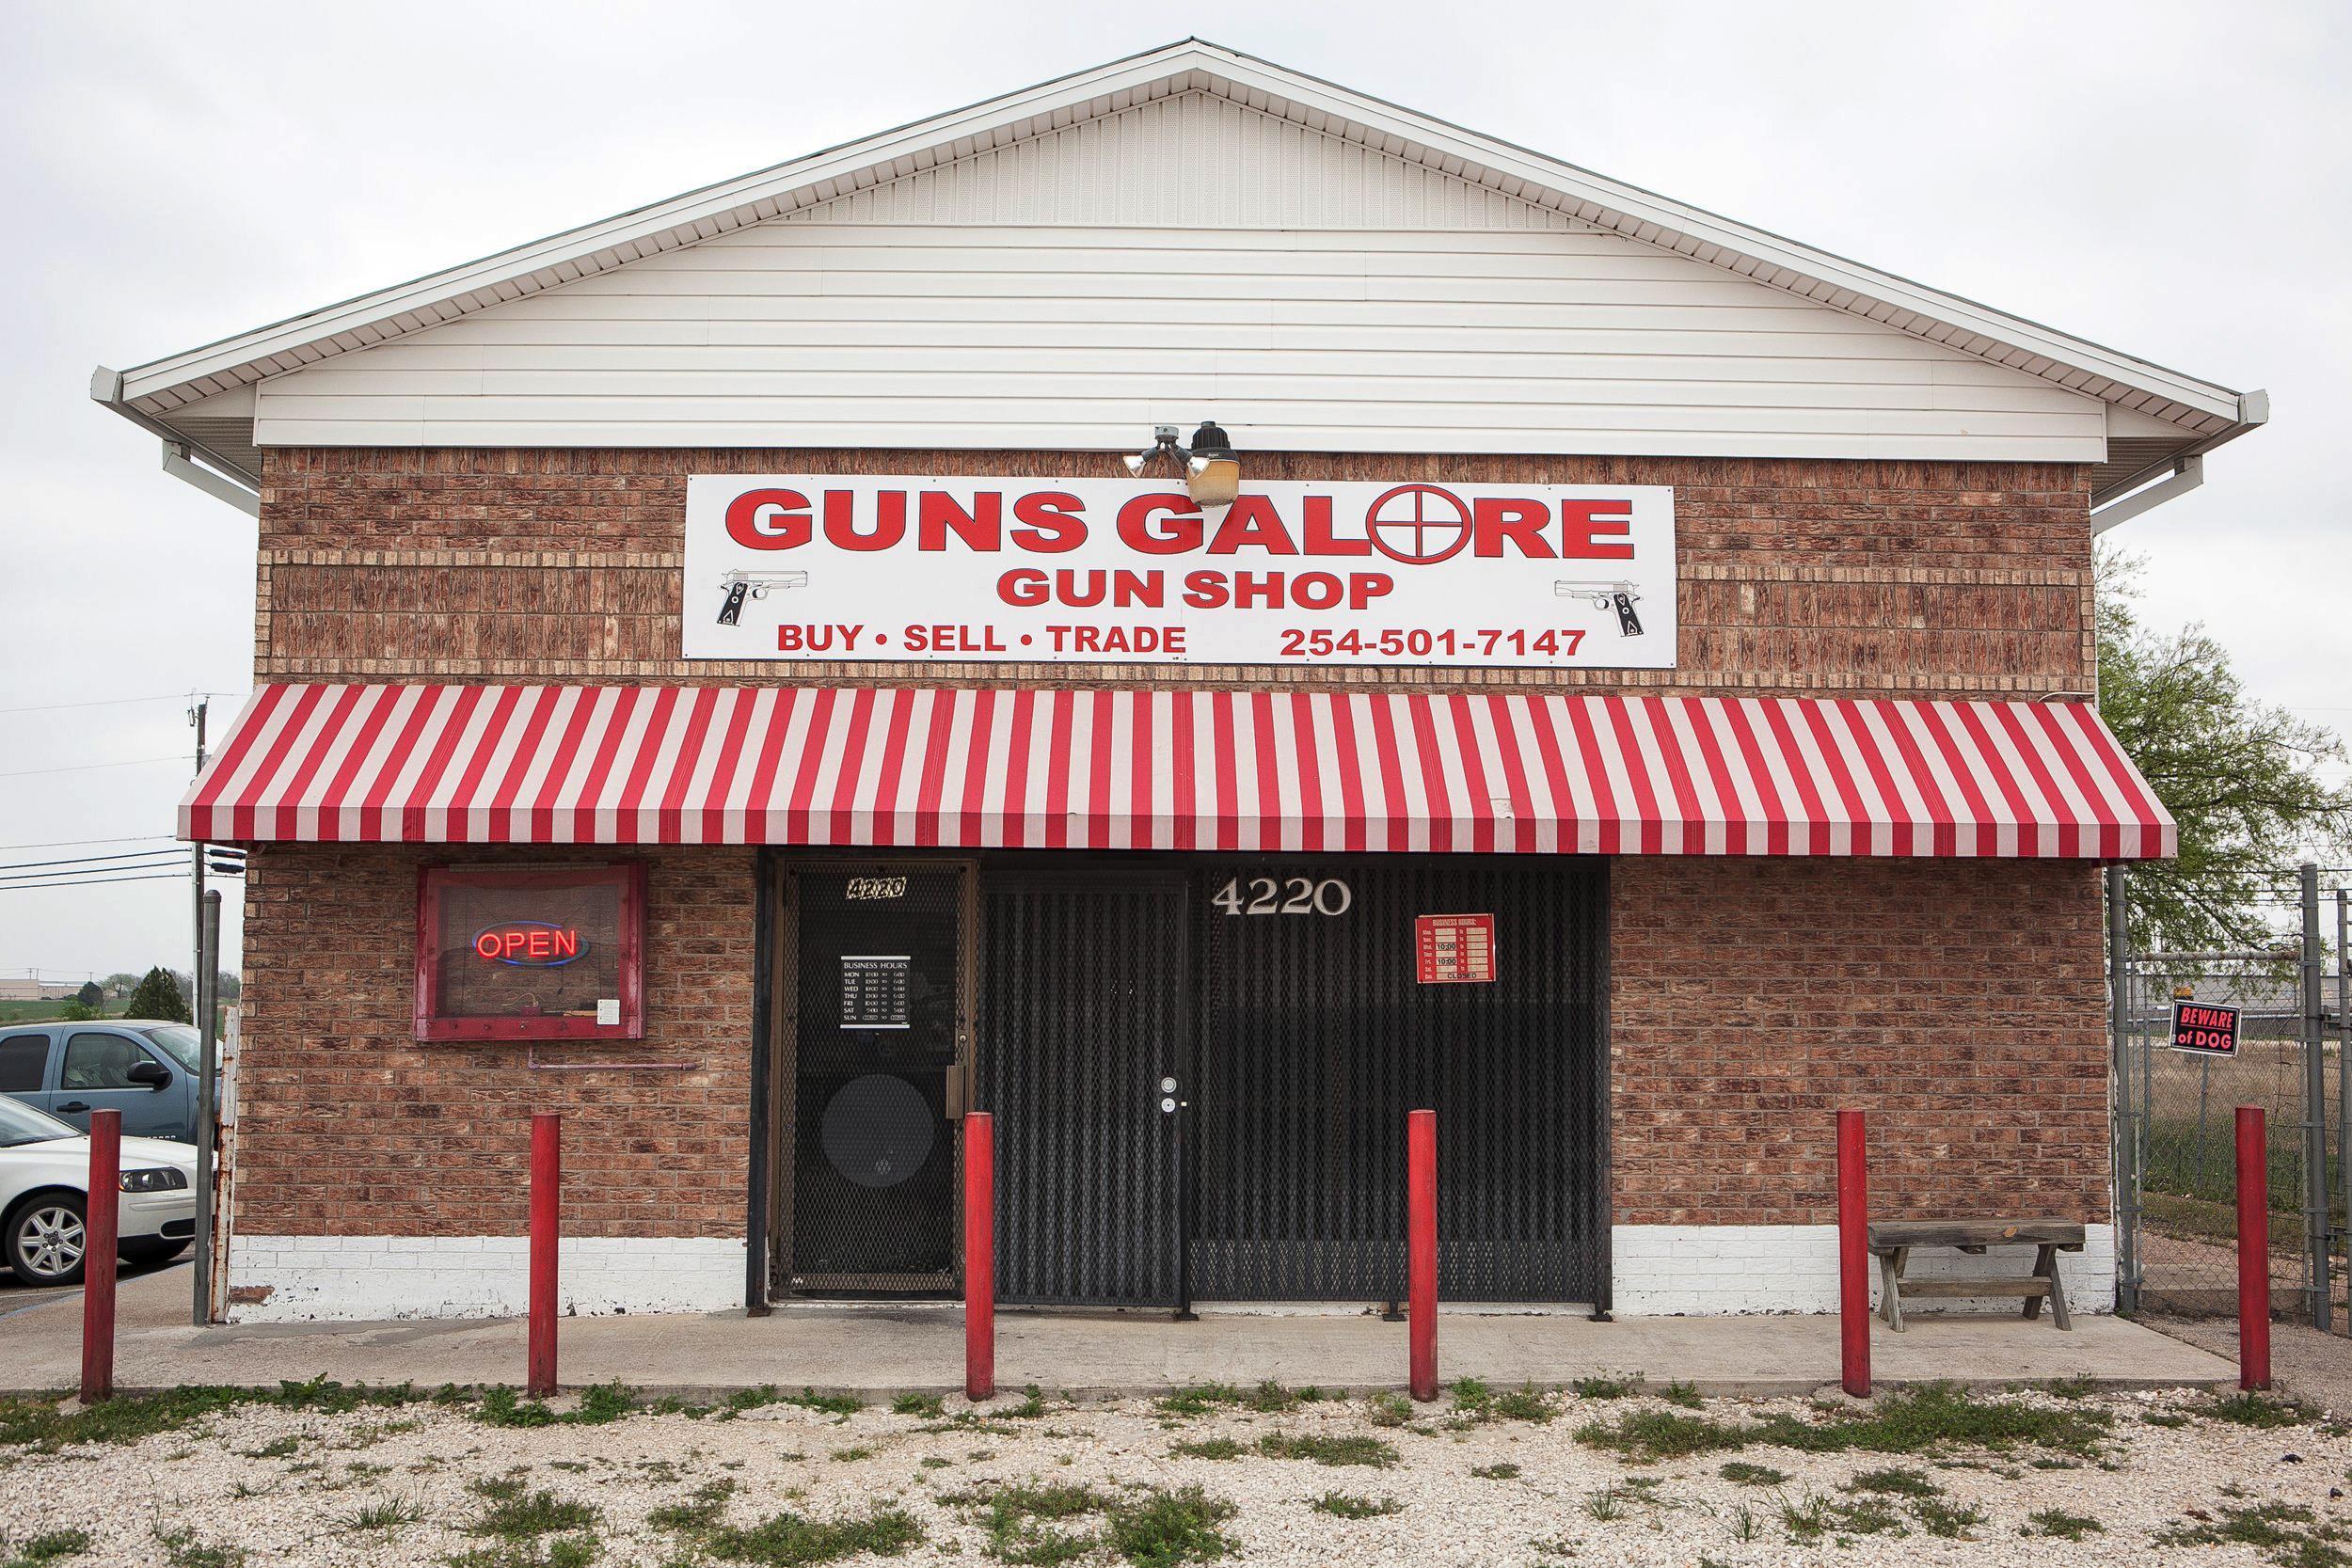 Image: Guns Galore in Killeen, Texas